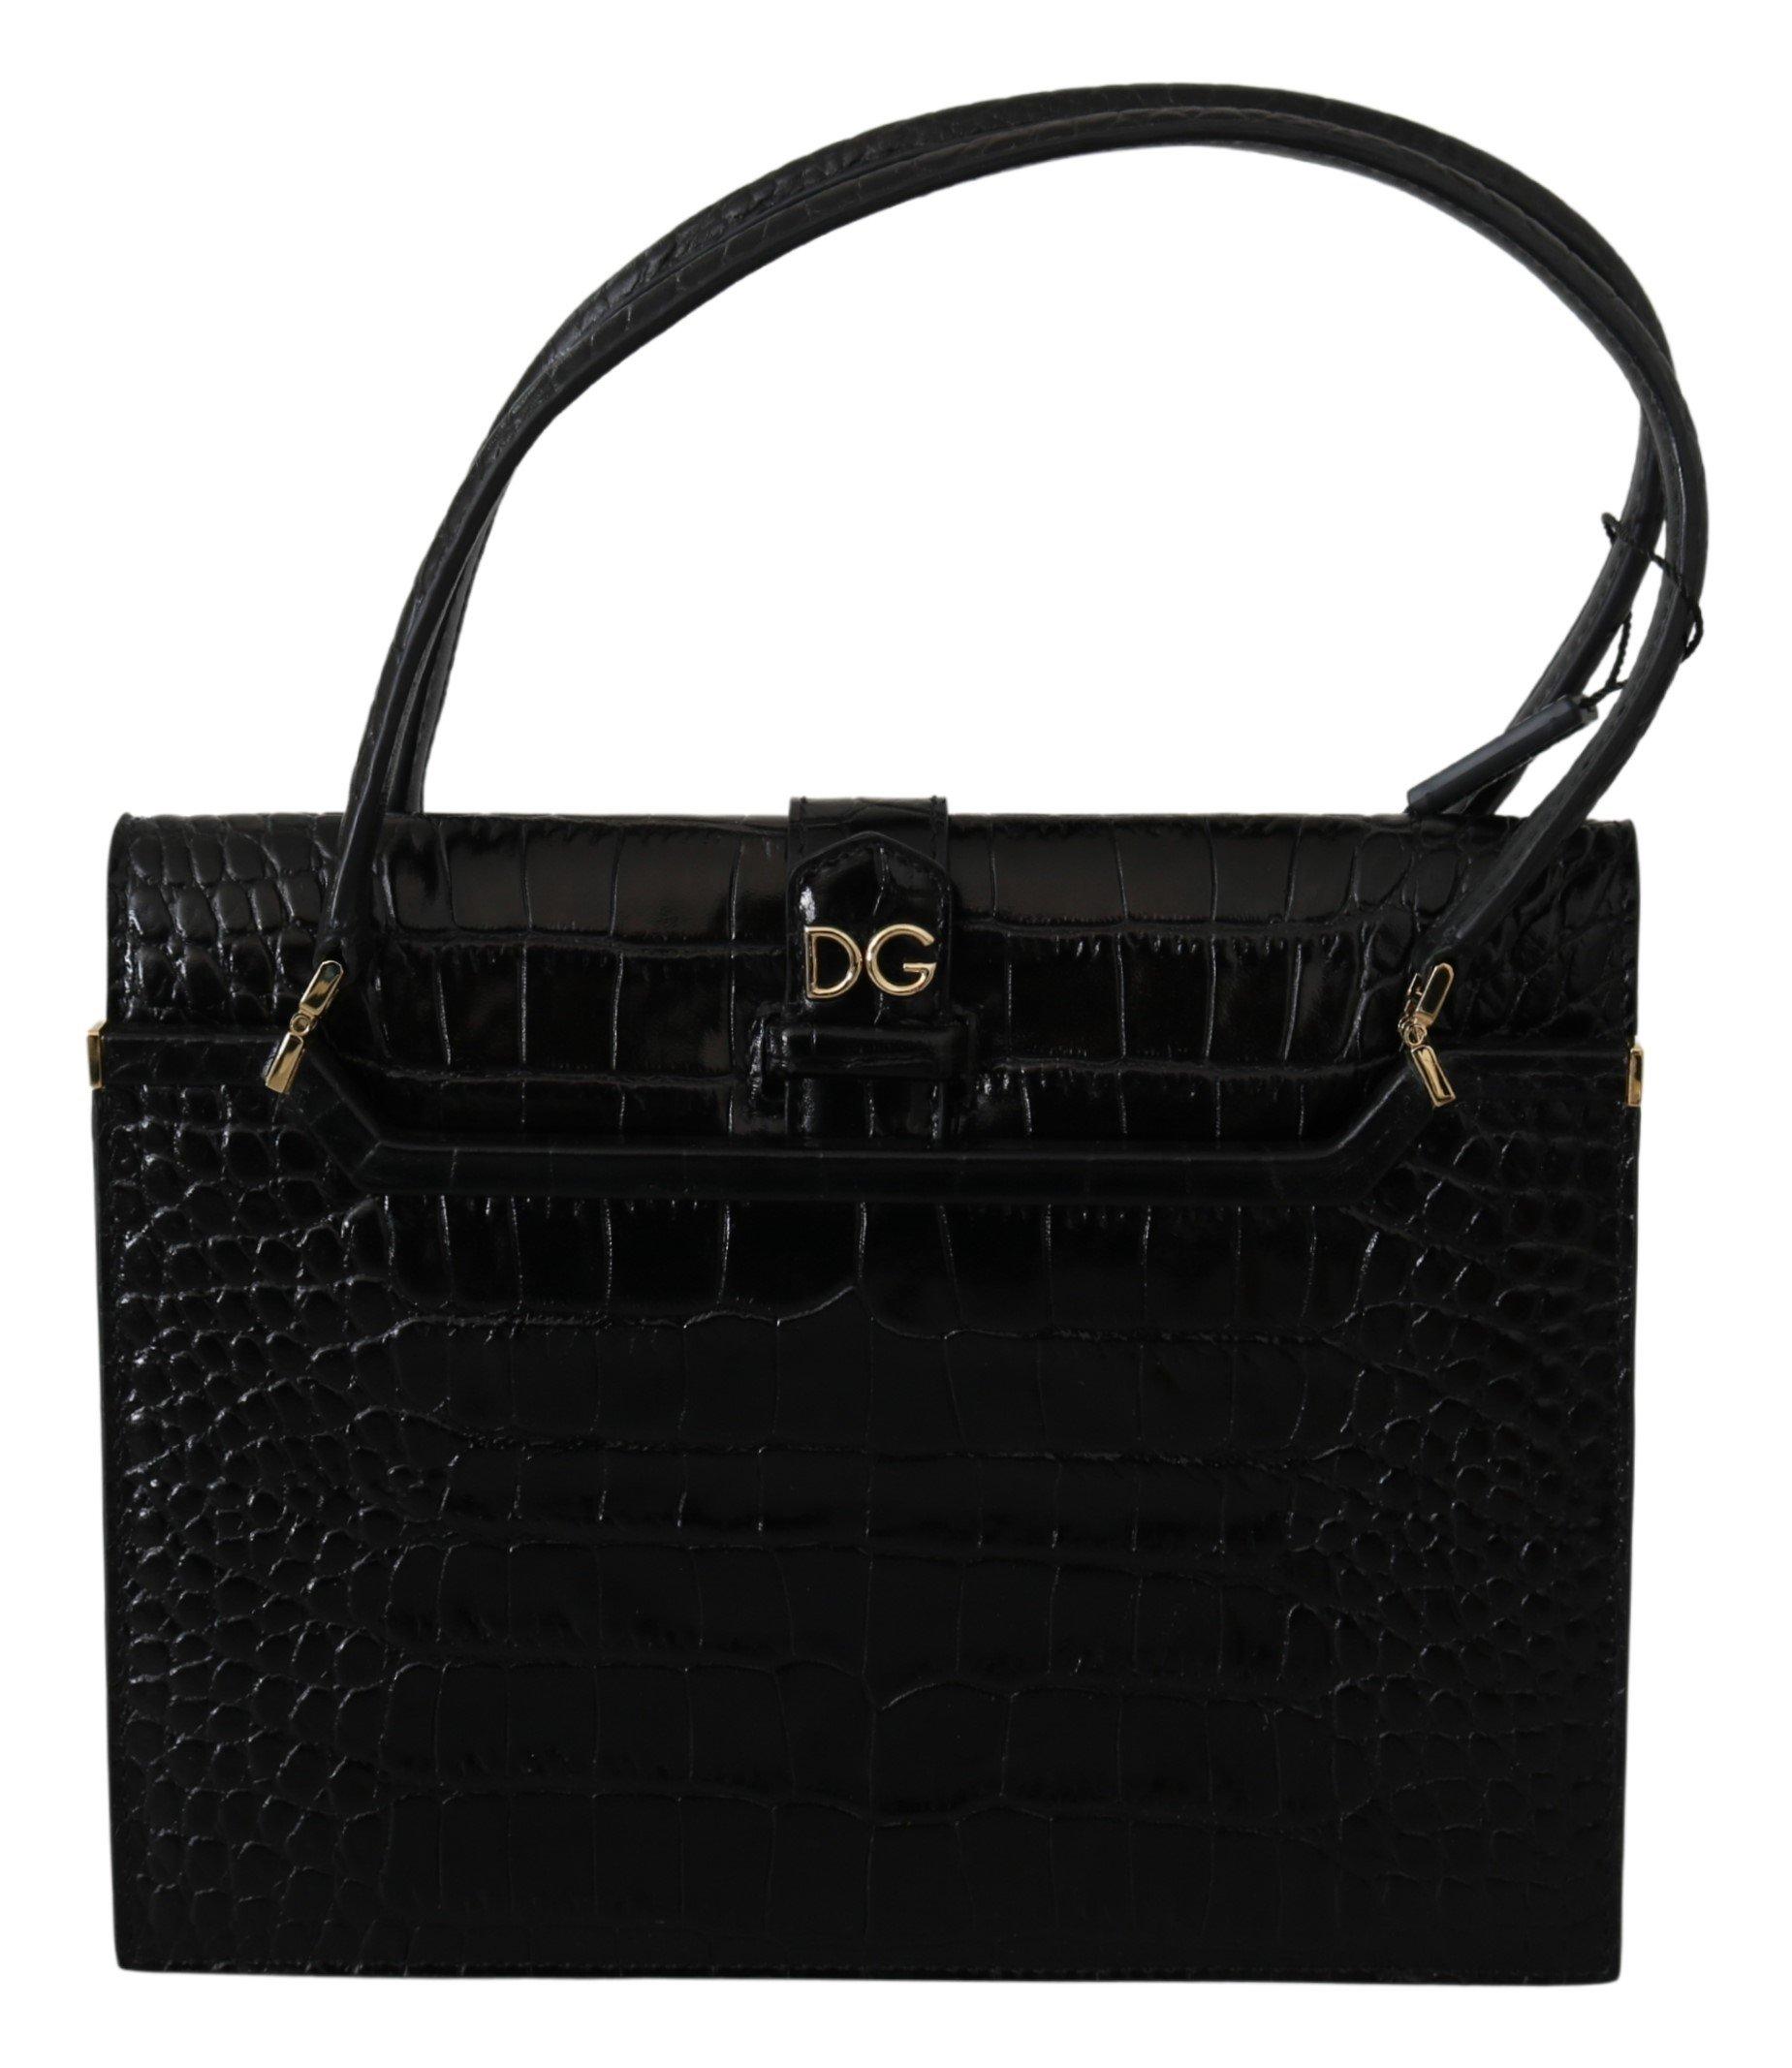 Dolce & Gabbana Women's Crocodile Print Leather Purse Black VAS9768